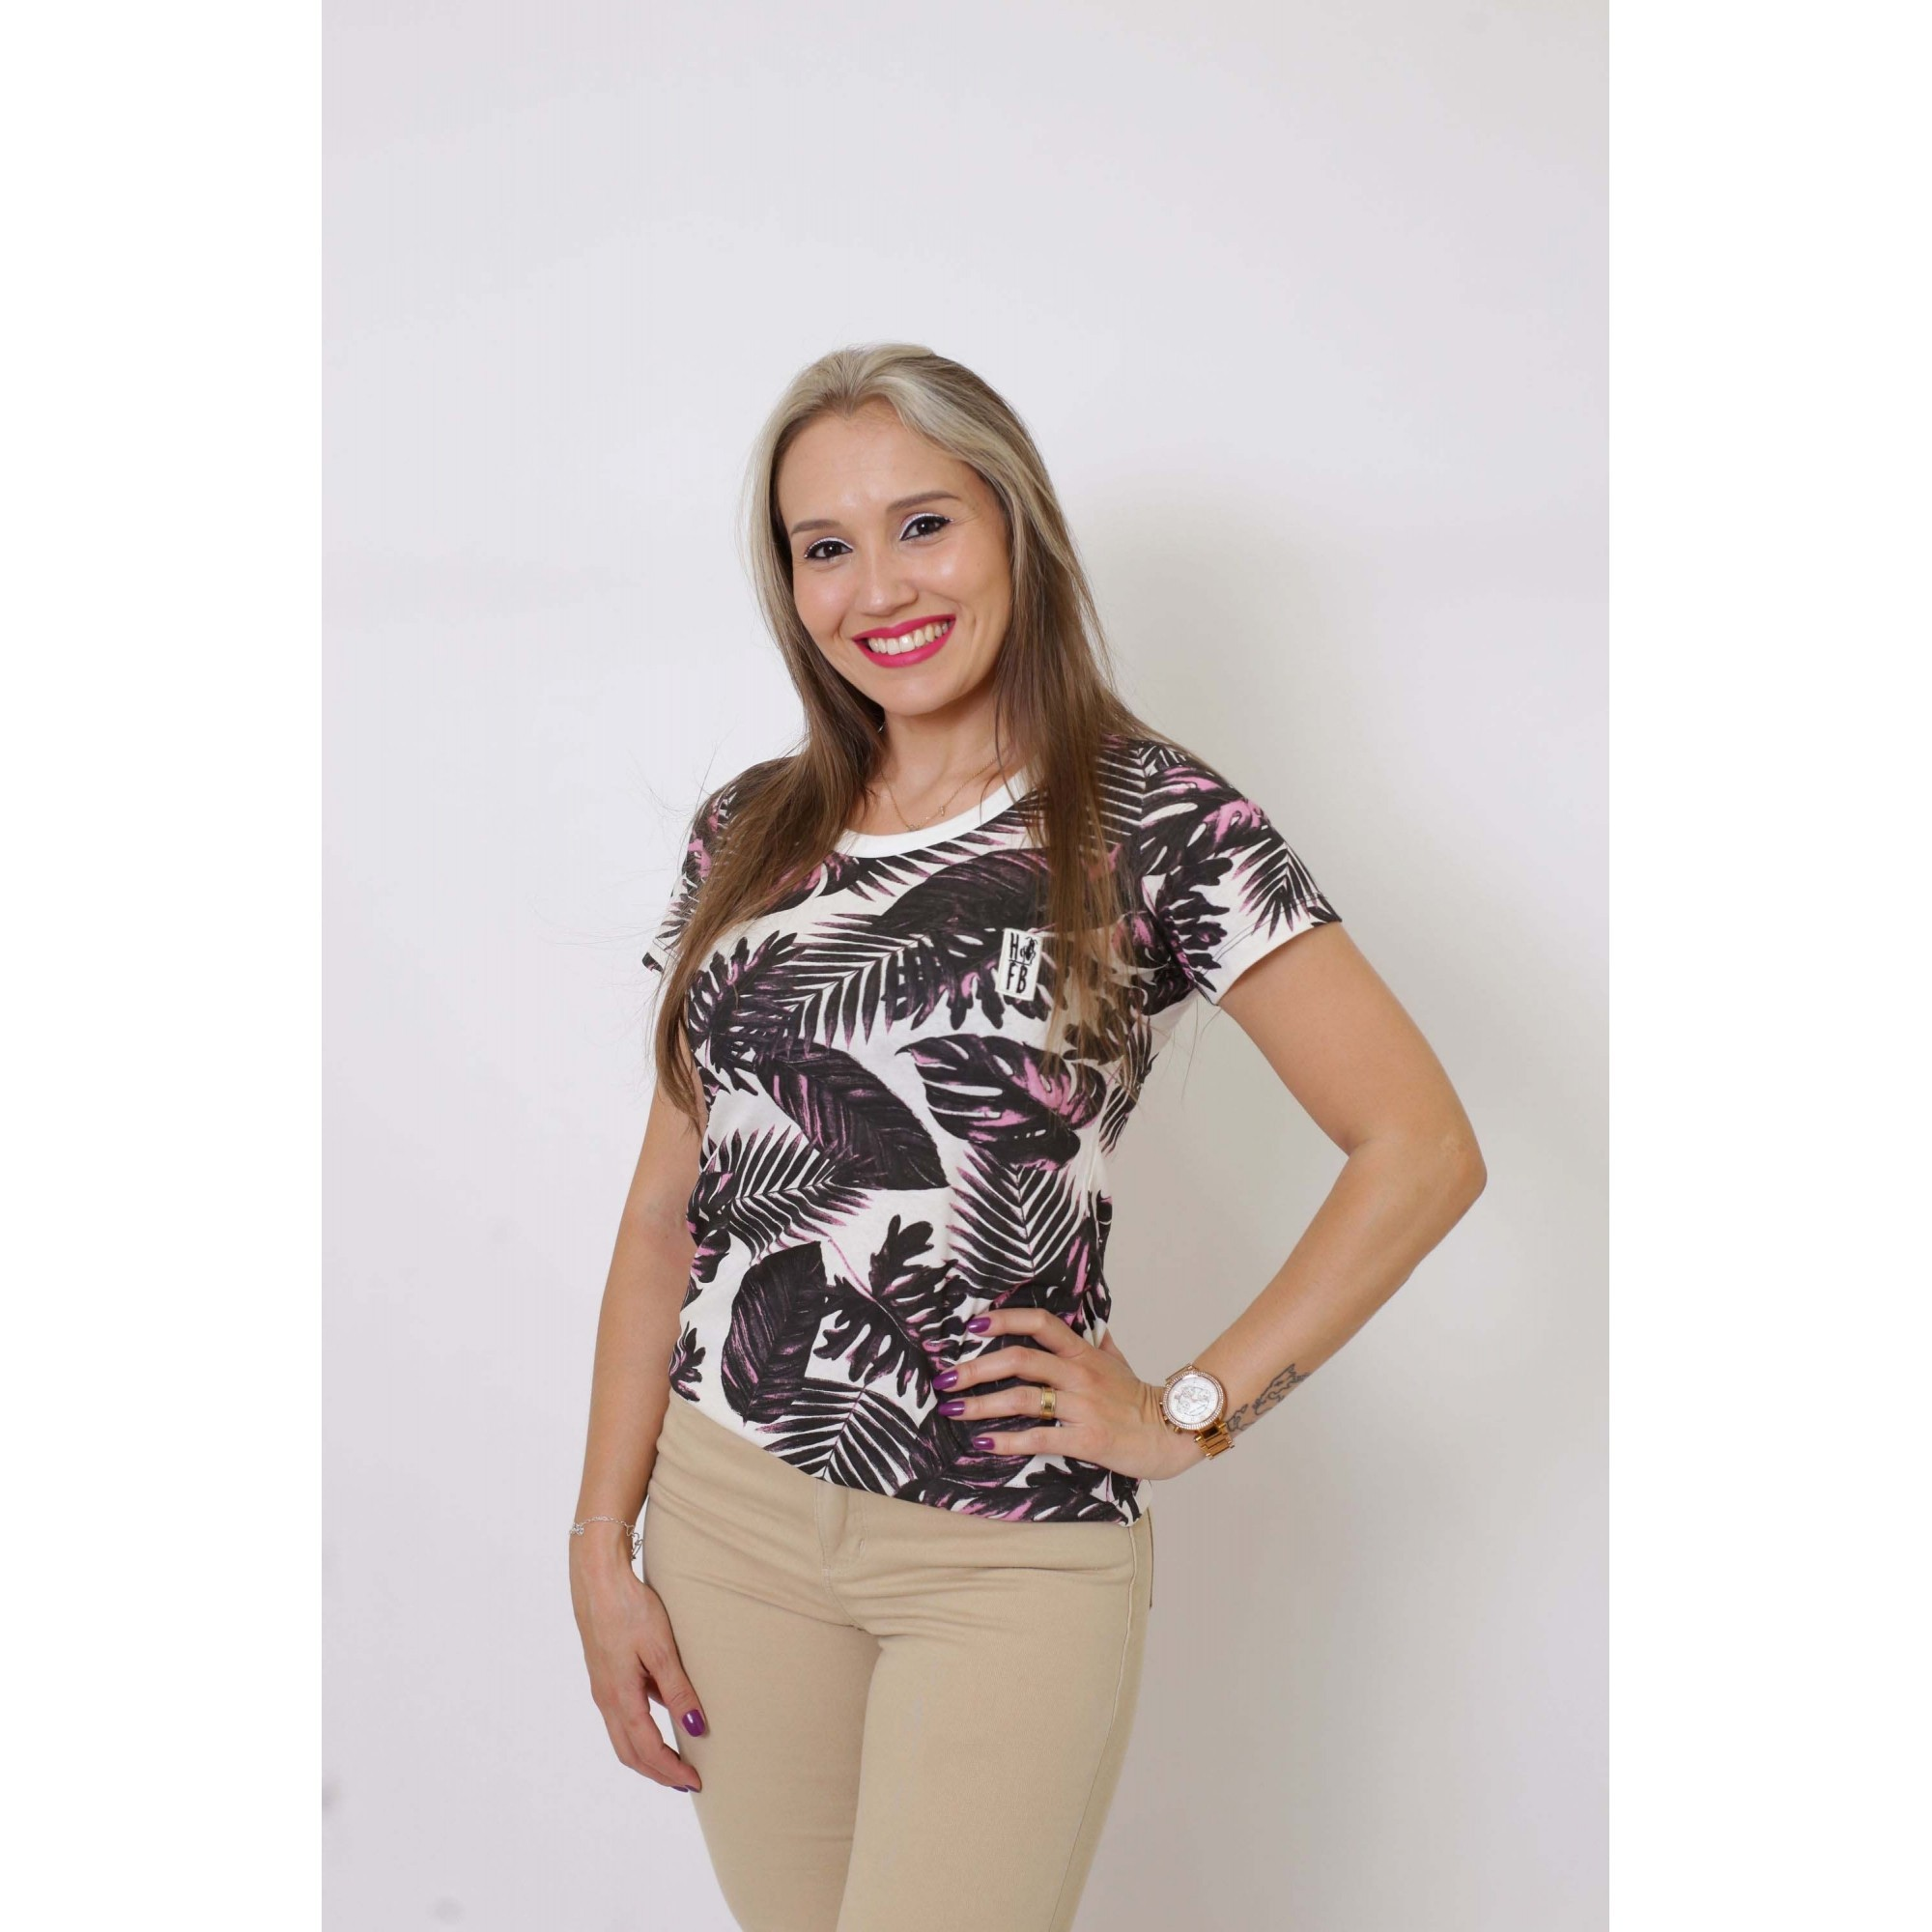 MÃE E FILHA > Kit 02 Peças T-Shirts - Cancún [Coleção Tal Mãe Tal Filha]  - Heitor Fashion Brazil